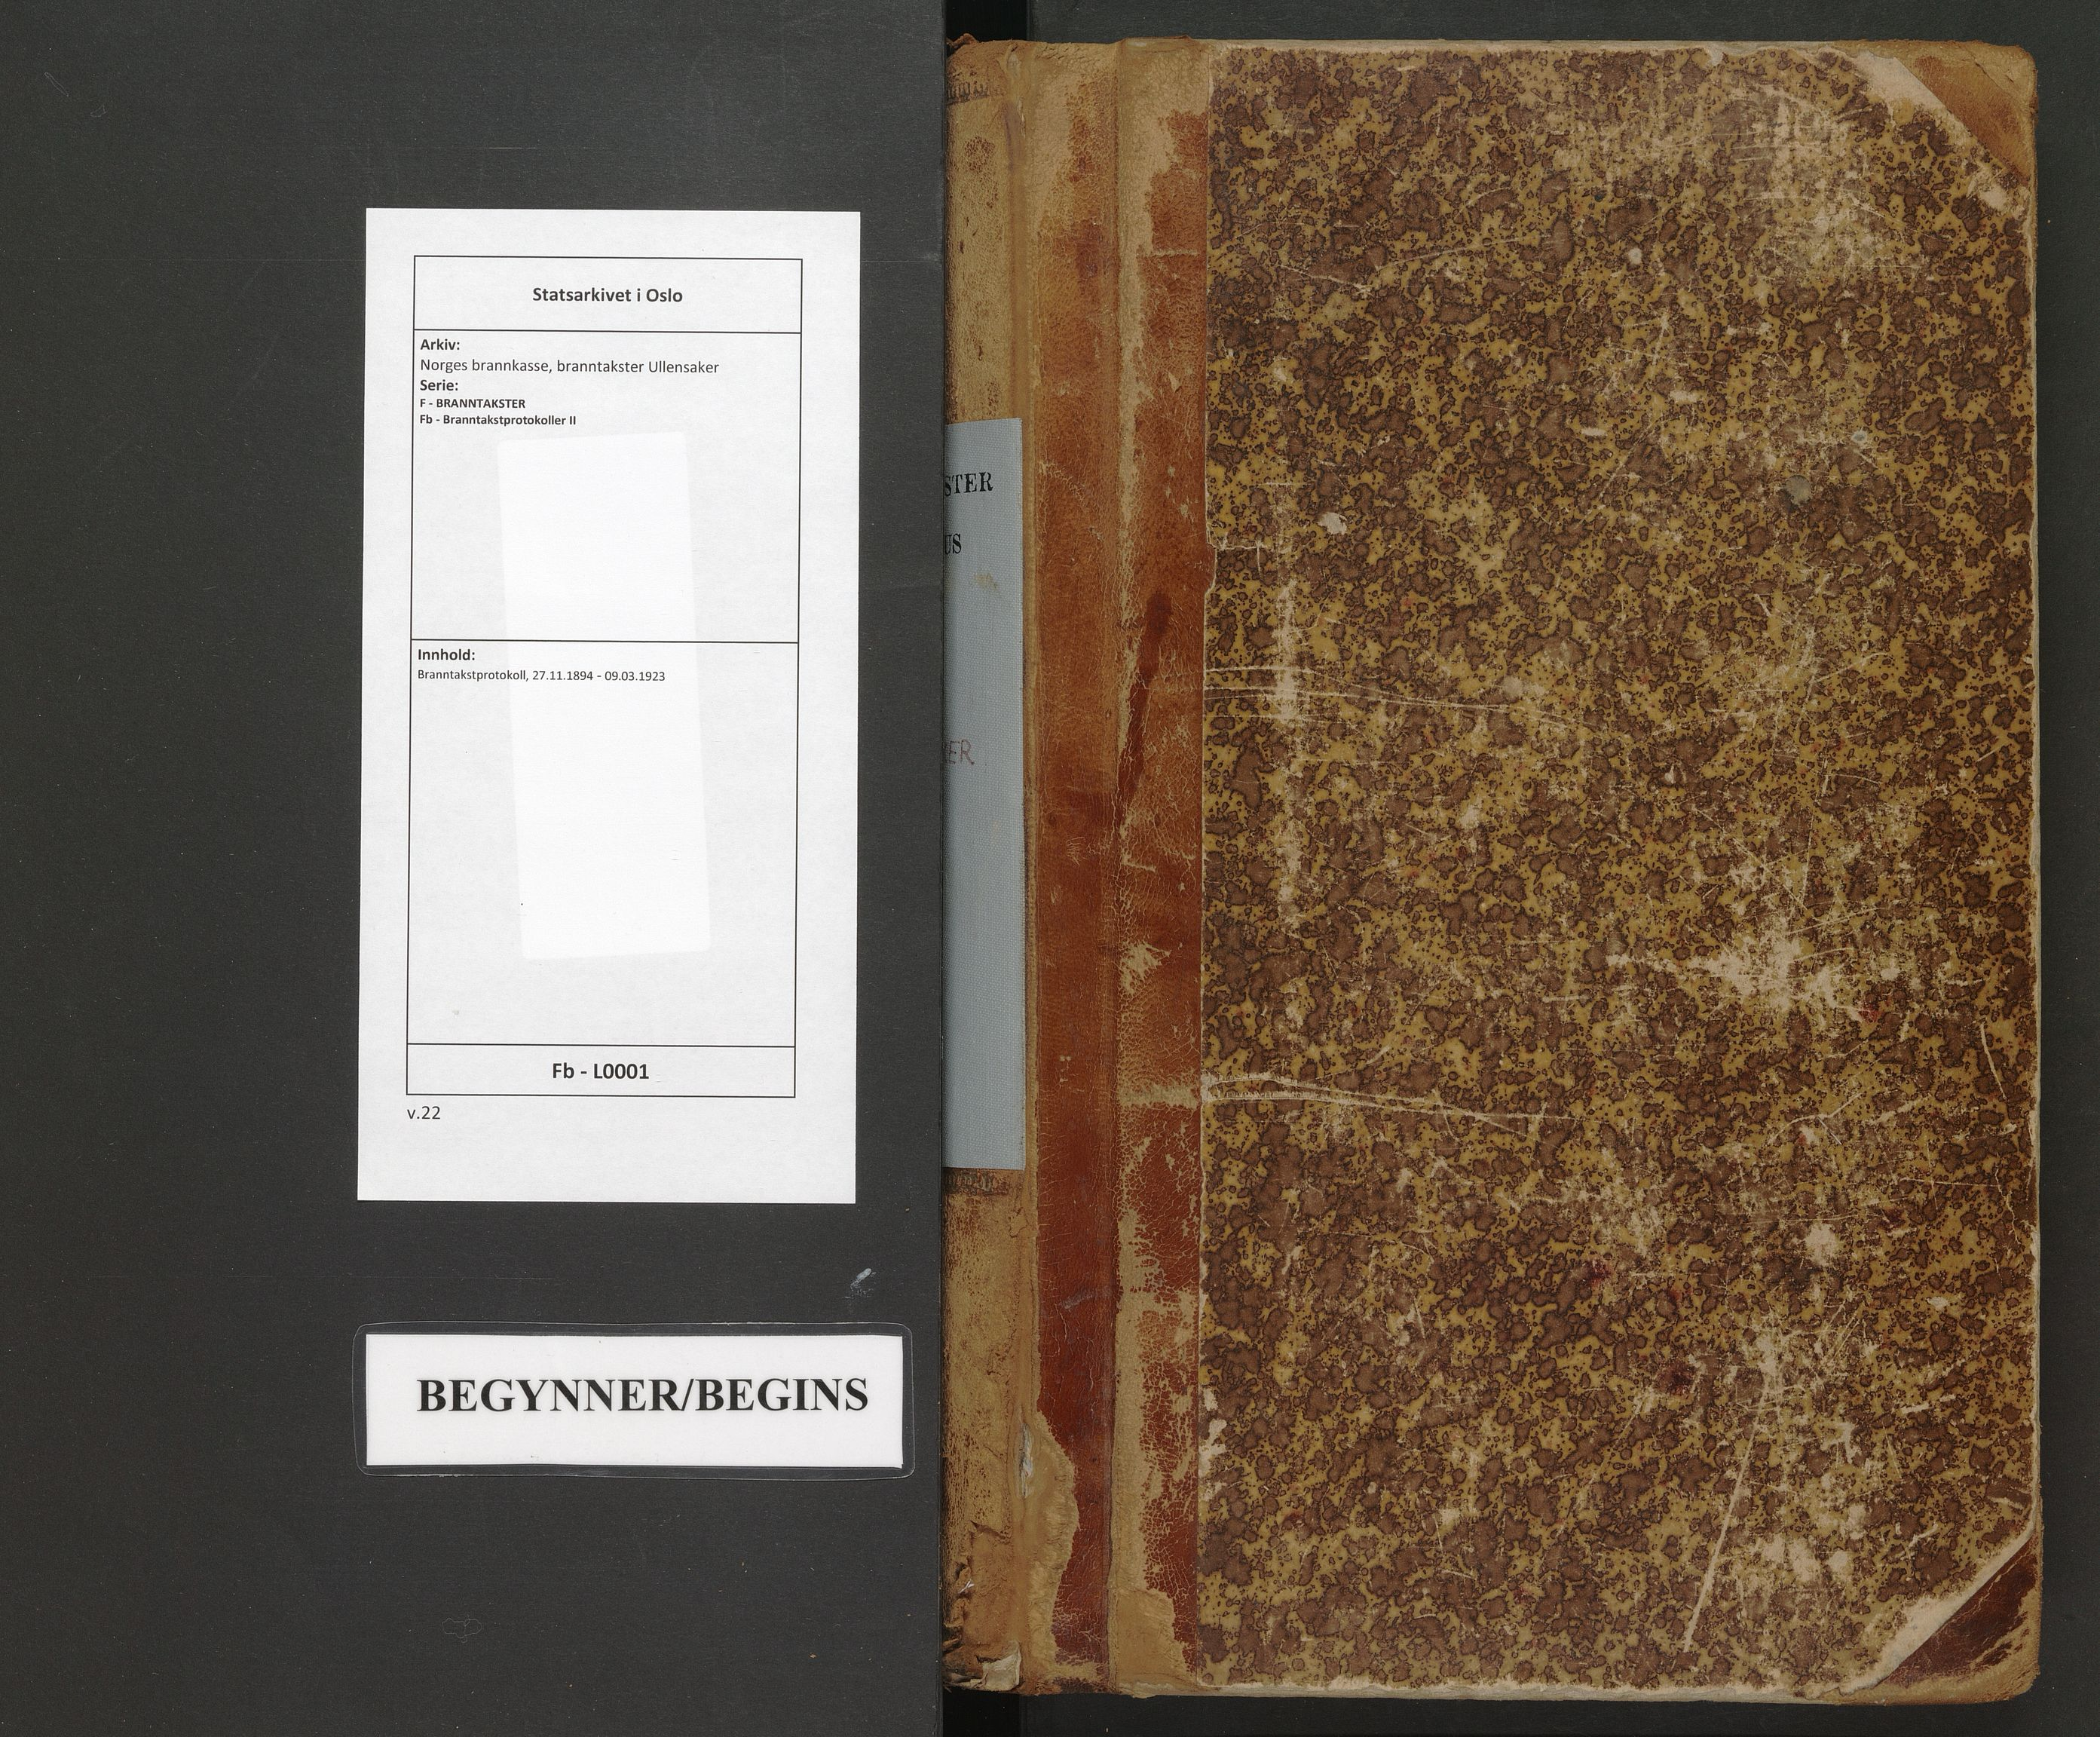 SAO, Norges brannkasse, branntakster Ullensaker, F/Fb/L0001: Branntakstprotokoll, 1894-1923